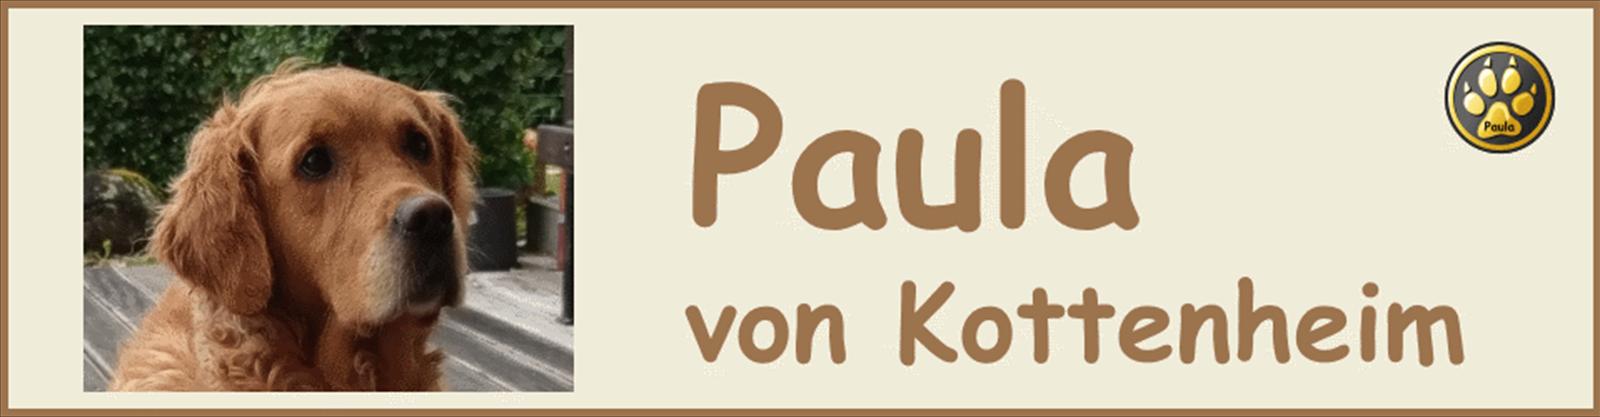 Paula-Banner-14